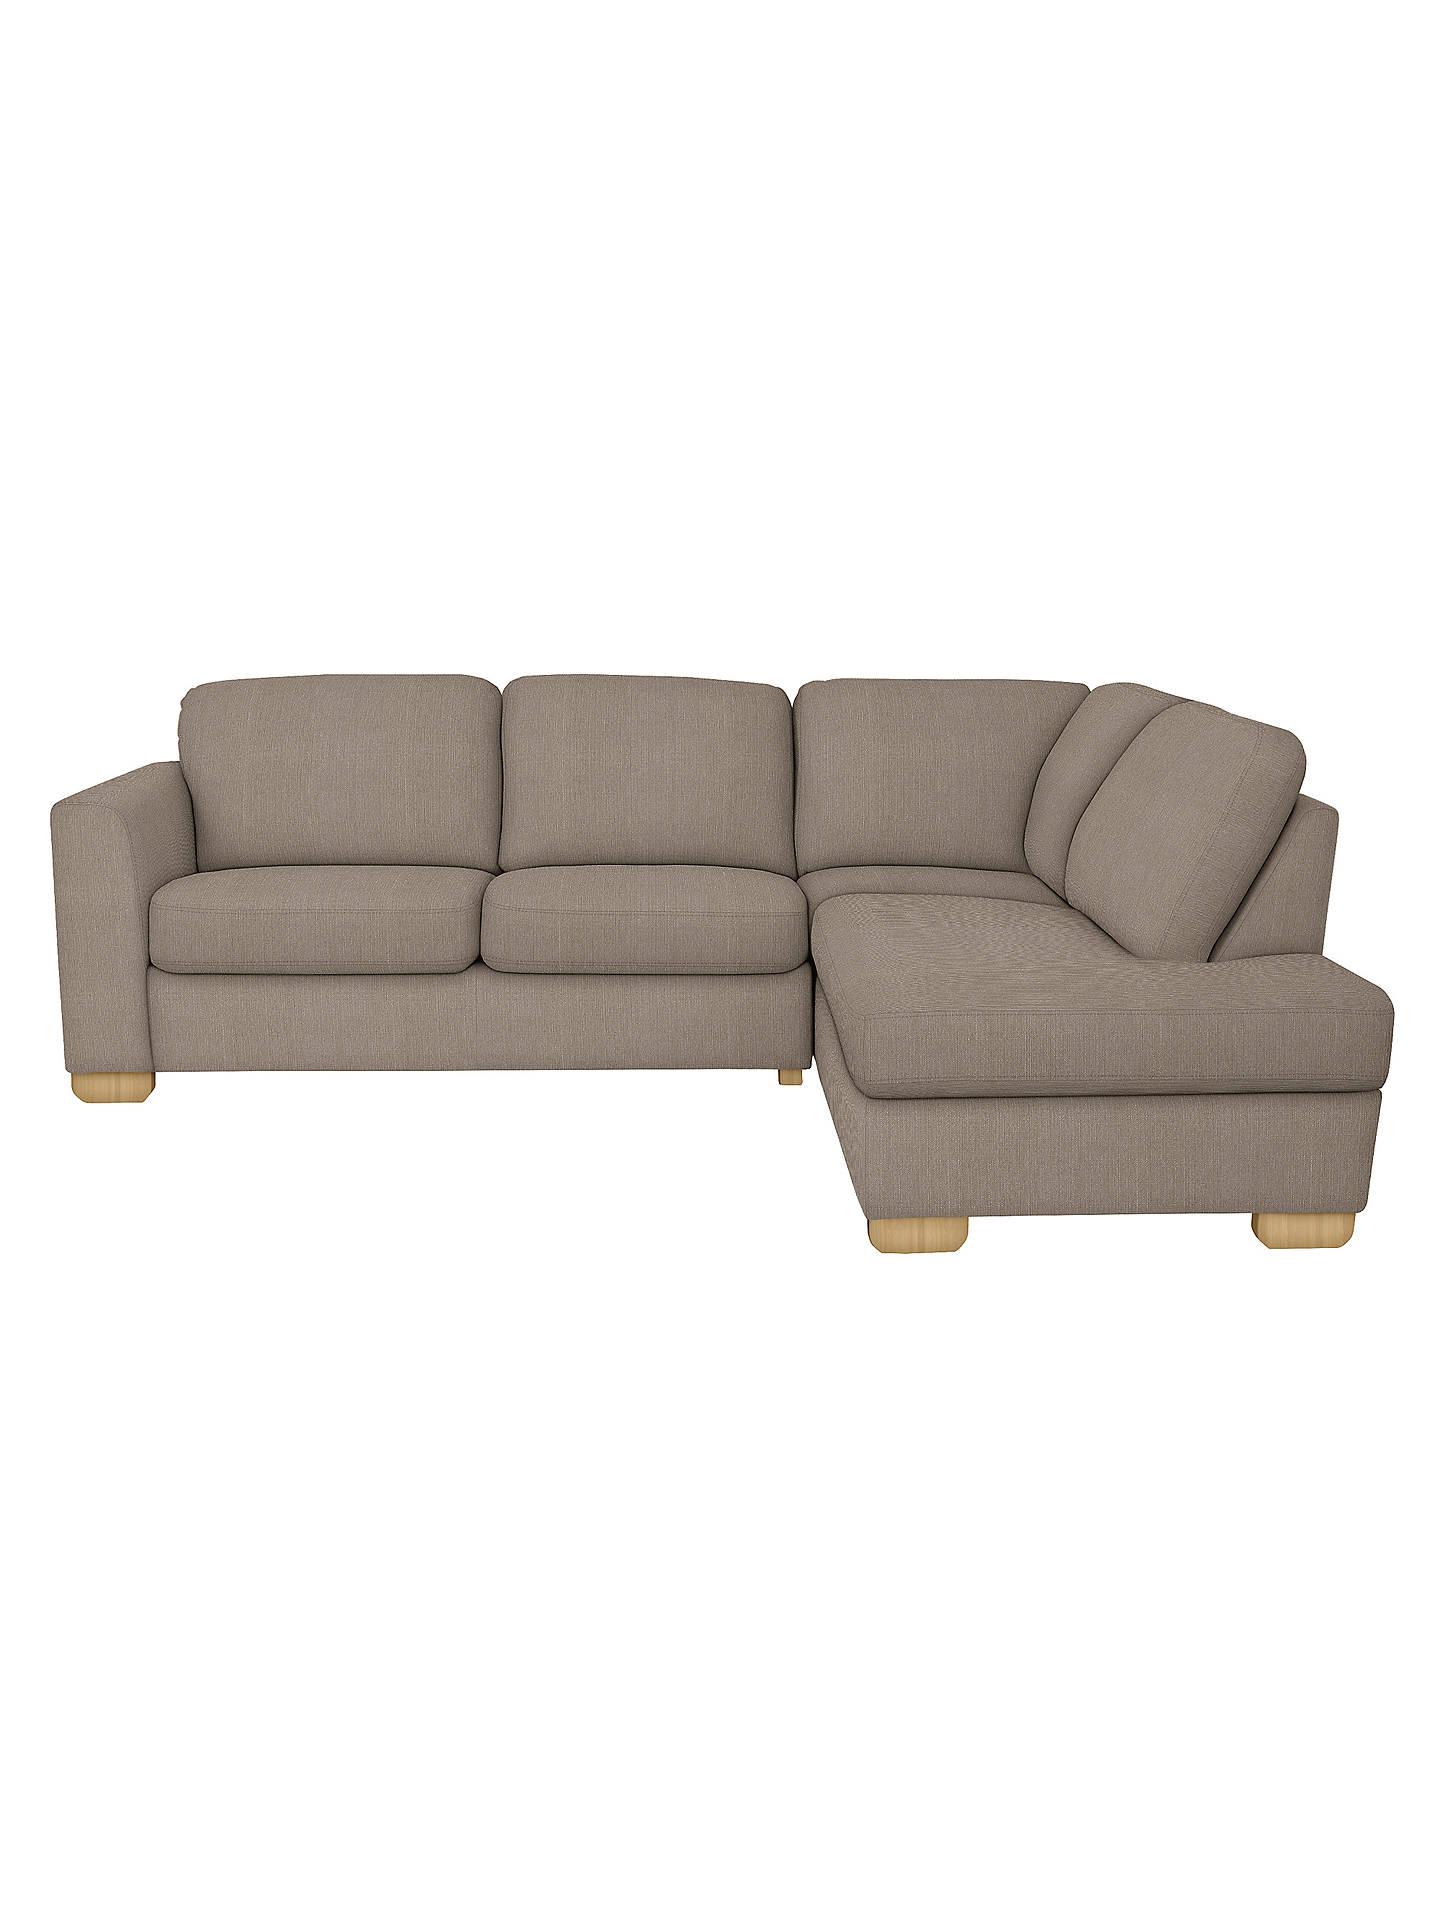 John Lewis Cooper RHF Corner Chaise Sofa, Bala Charcoal At